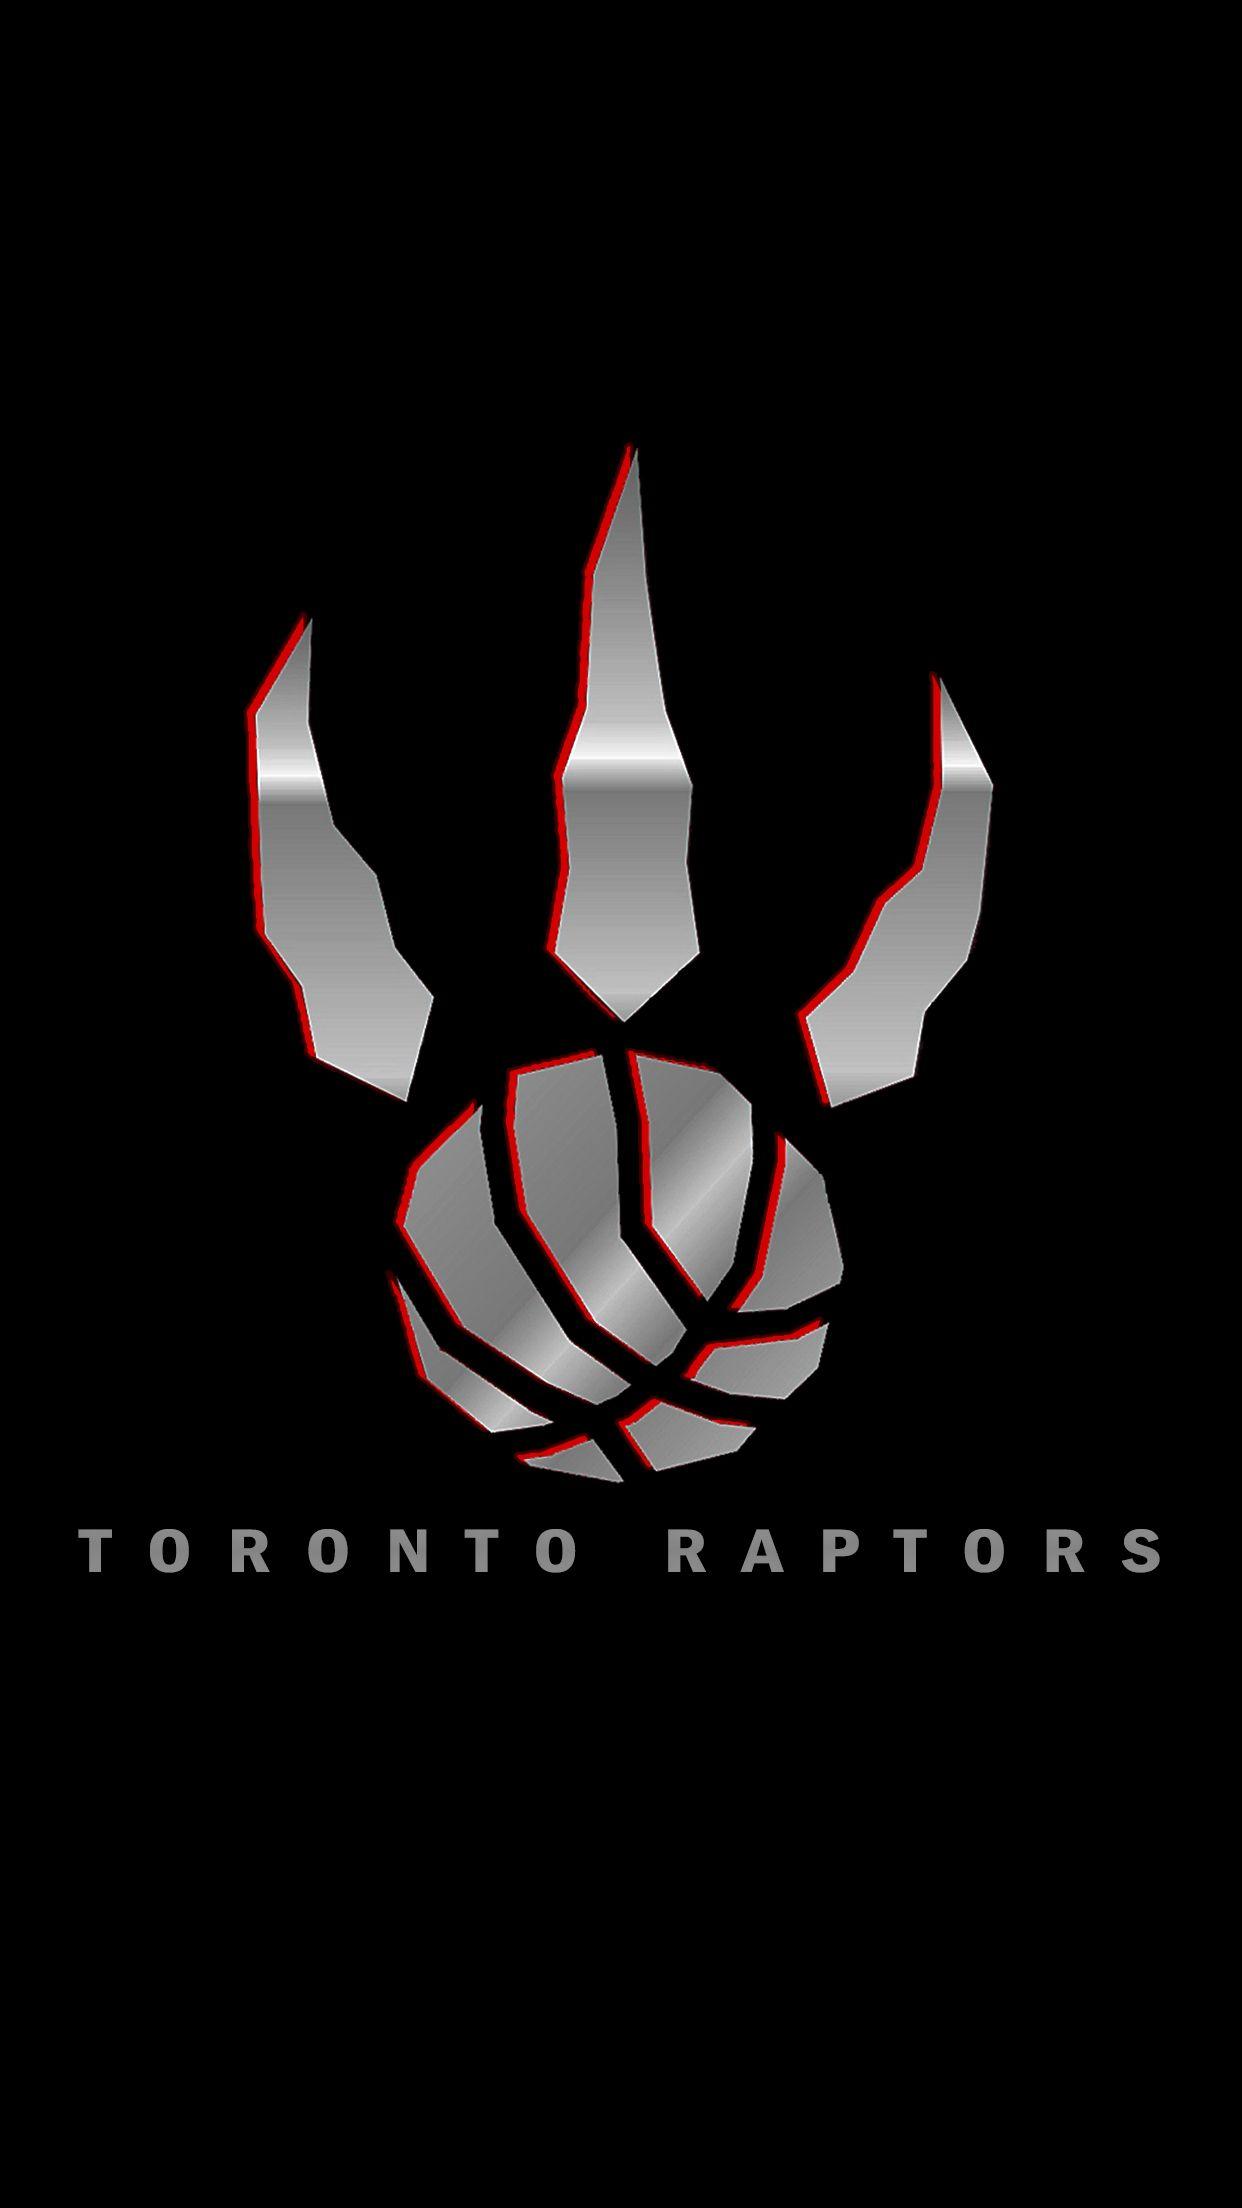 Toronto Raptors Toronto Raptors Raptors Toronto Raptors Basketball